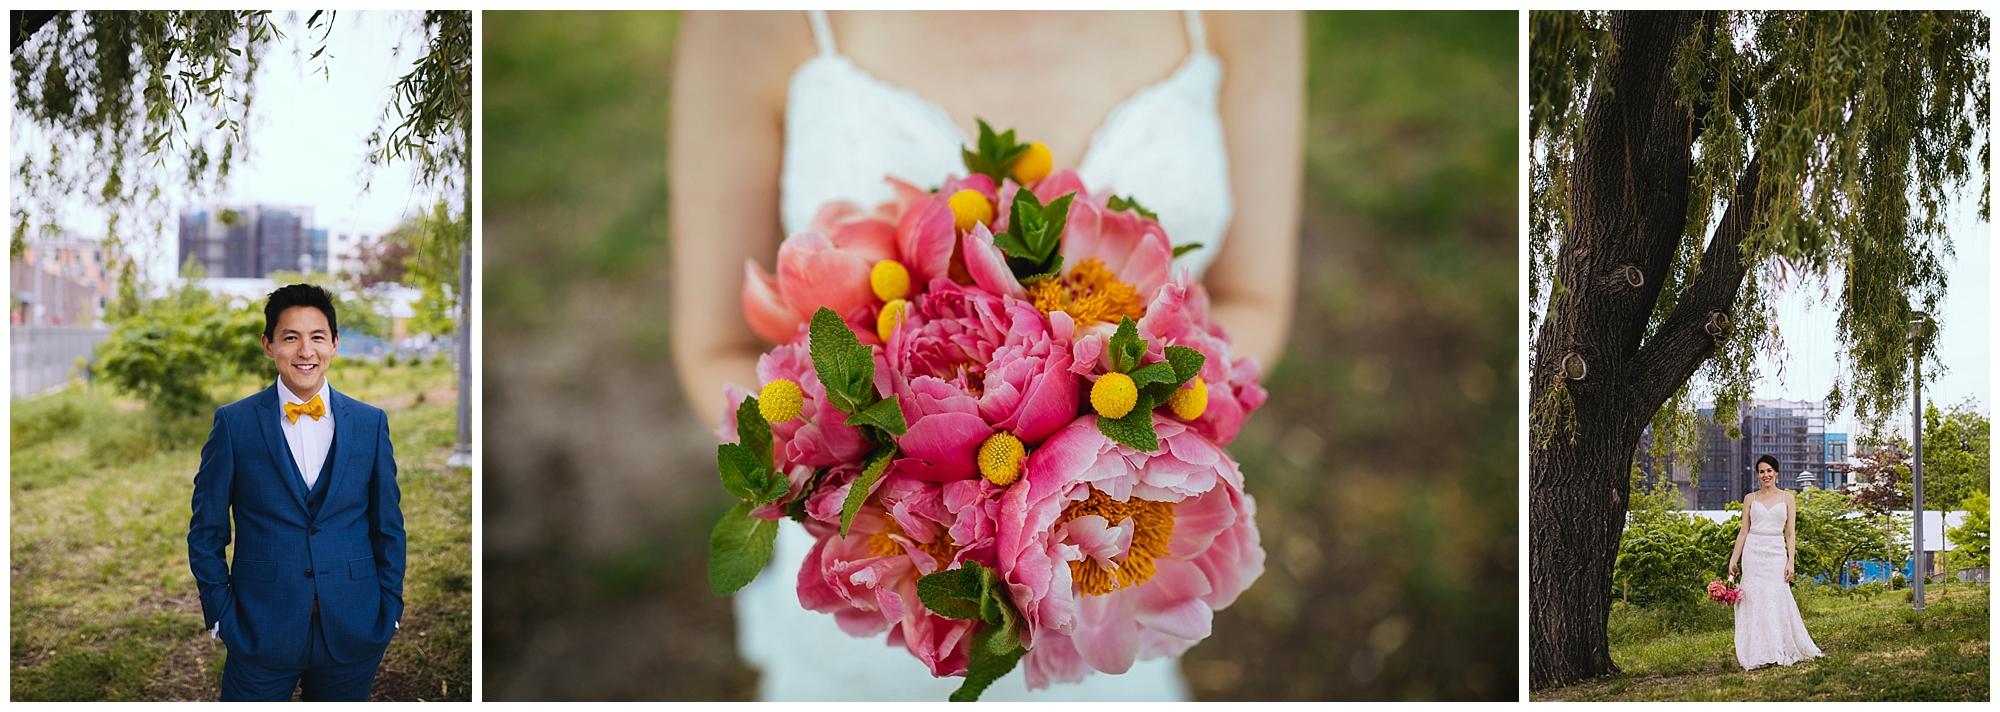 NYC-Wedding-Photographer11.jpg